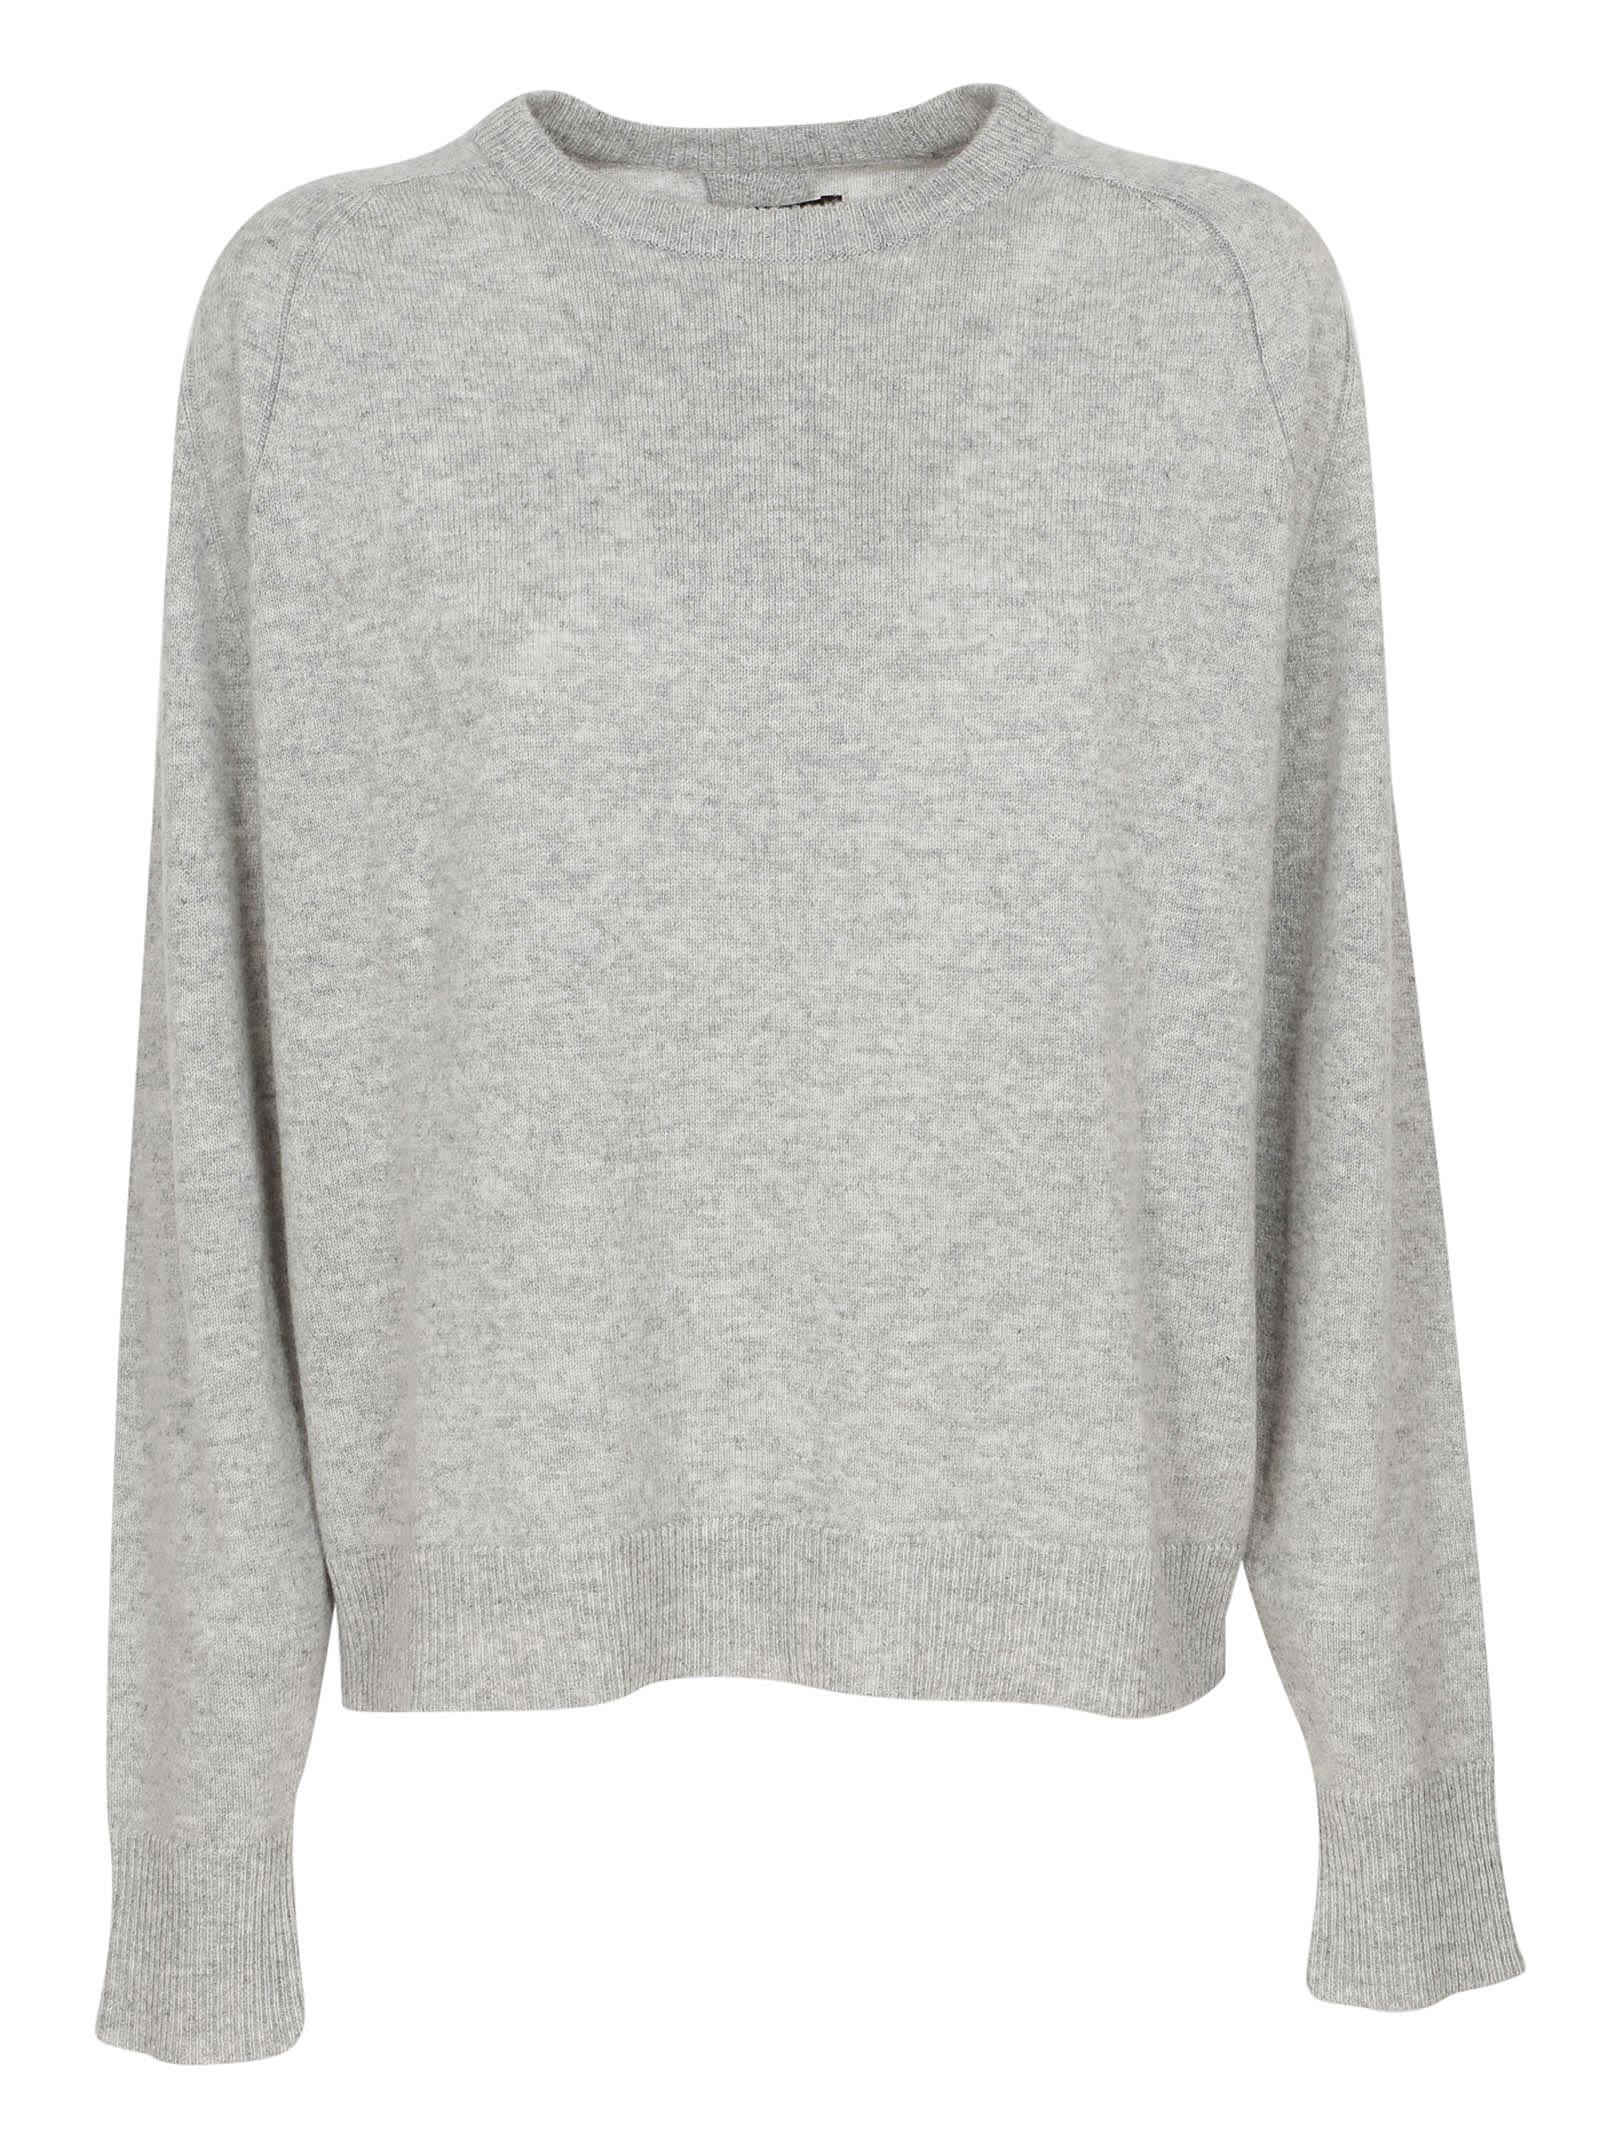 Isabel Marant Classic Sweater